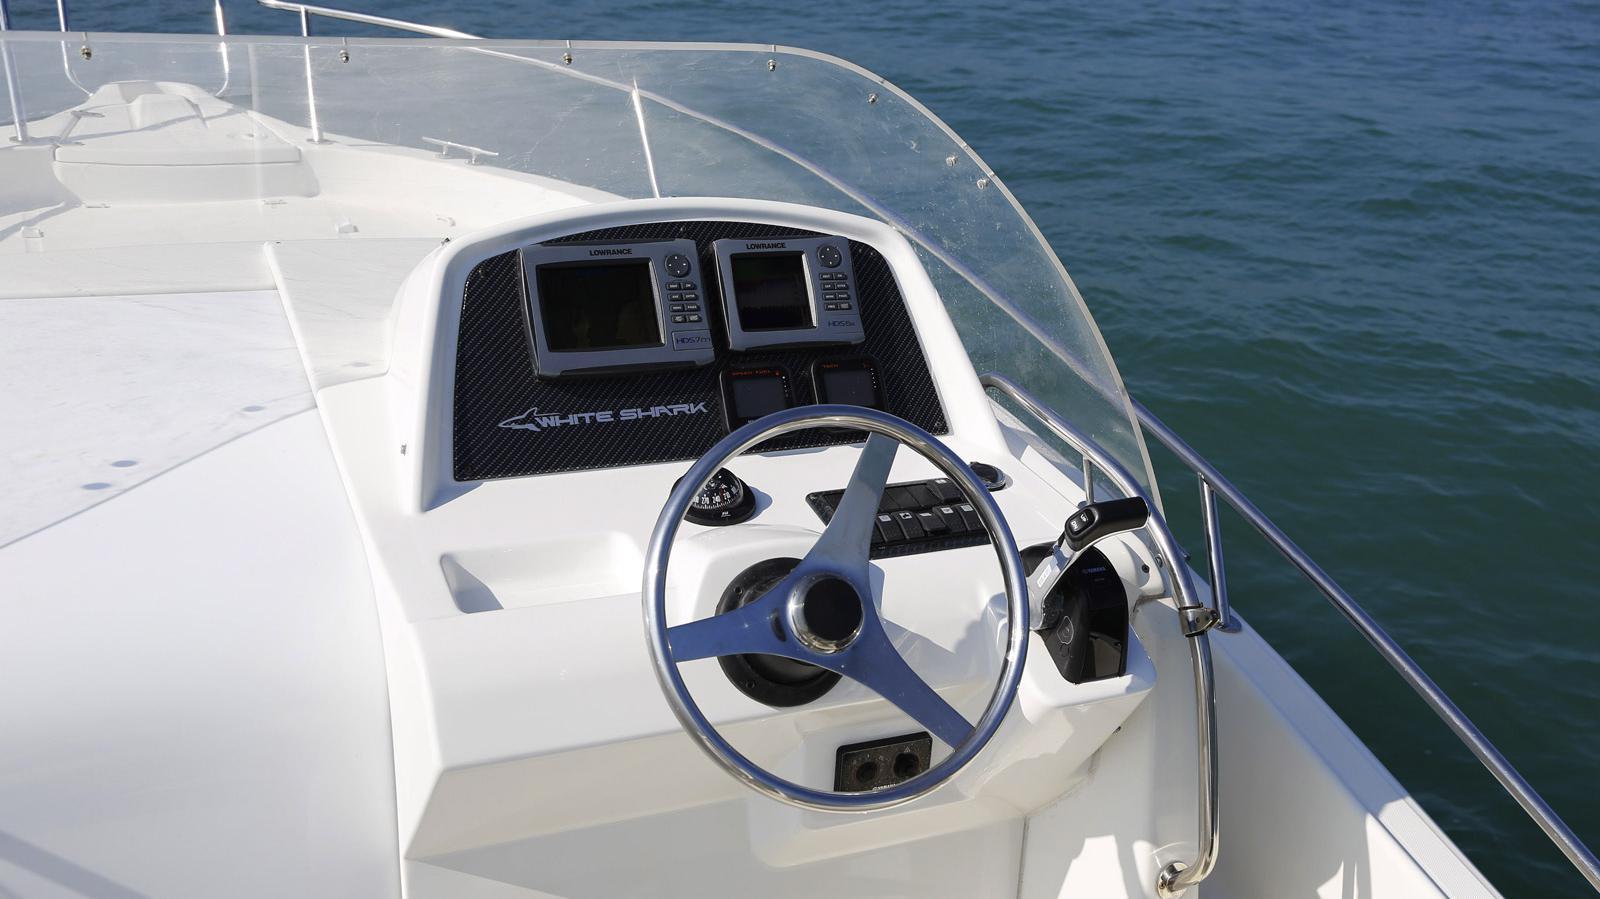 Sport Cabin 250 SC Origin - image 4